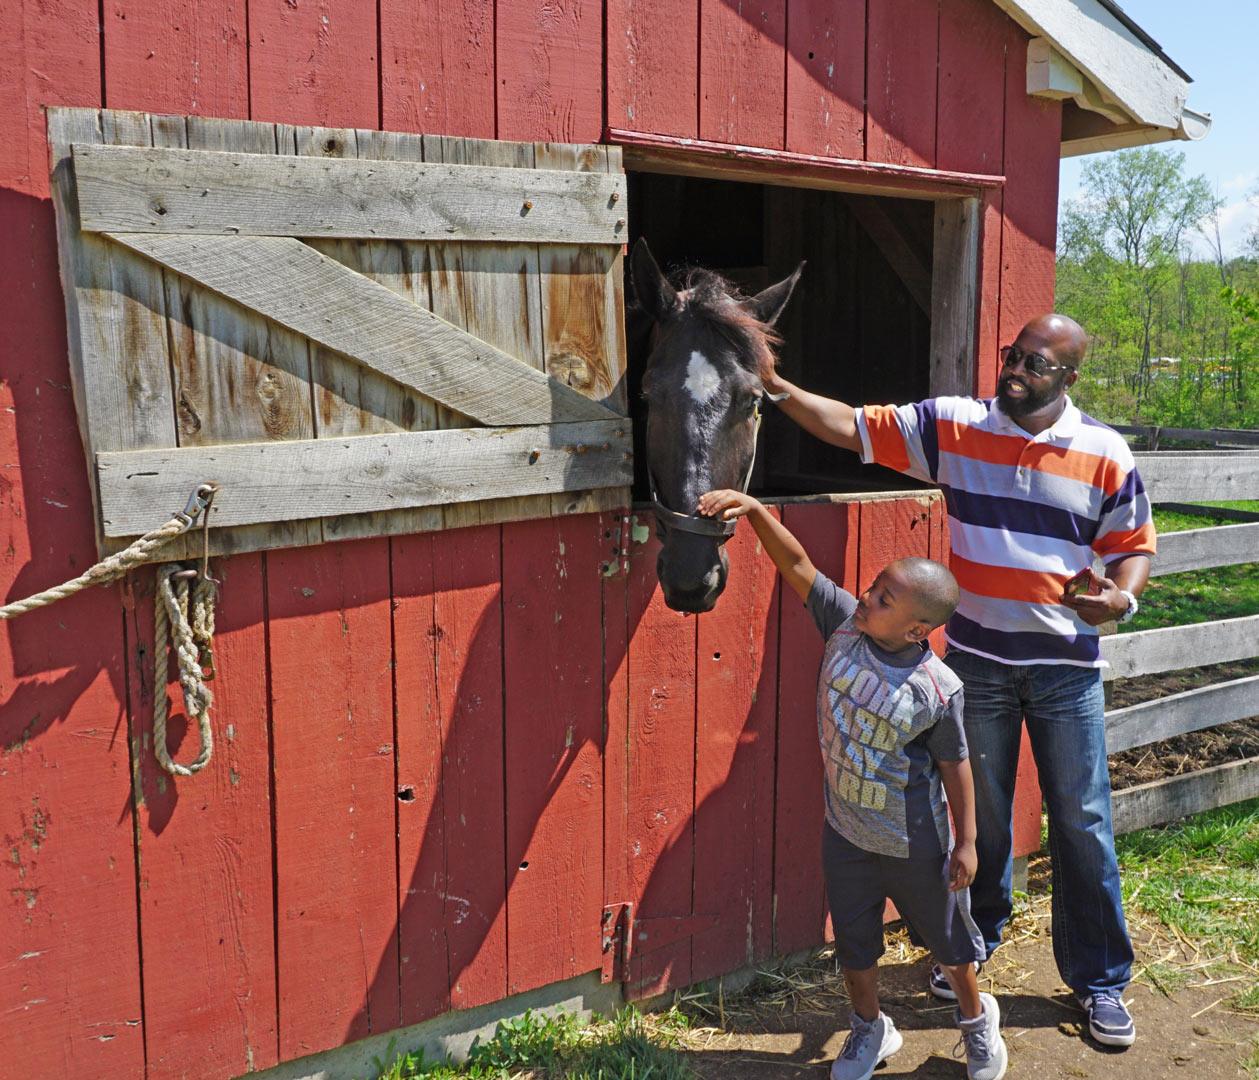 Vistors pet new Percheron horse Bob at Slate Run Farm